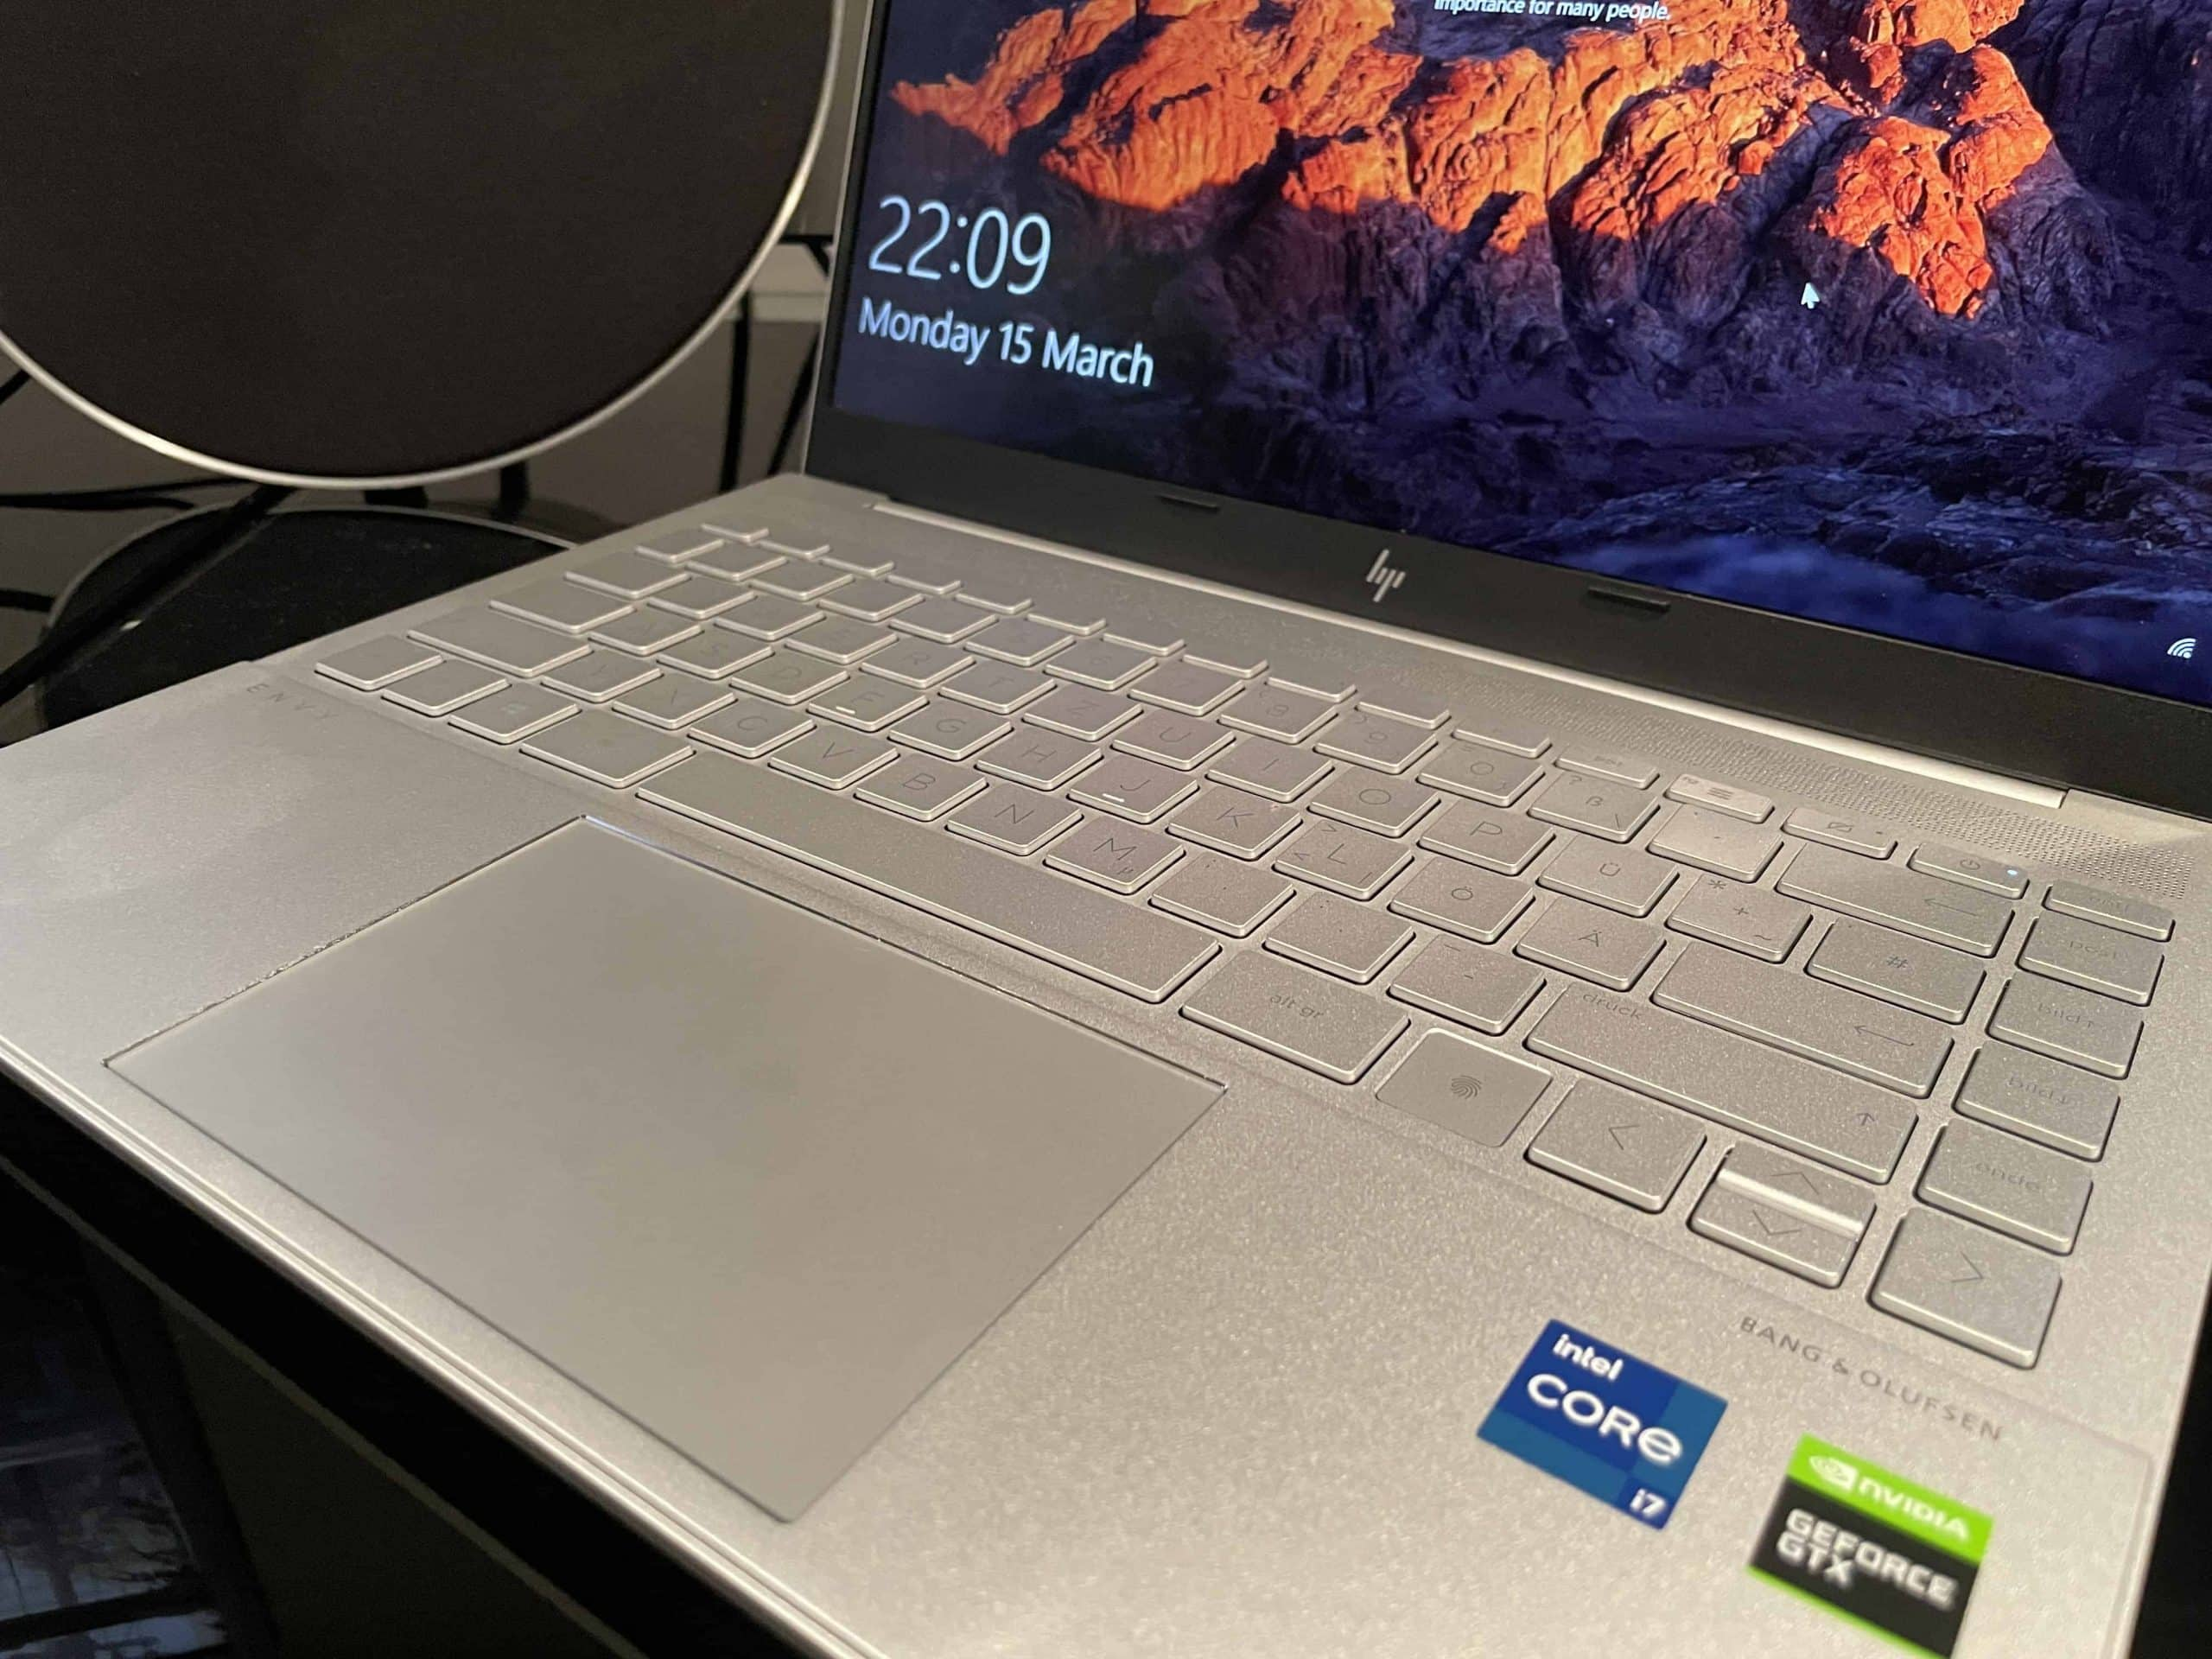 HP Envy 14 tastatur